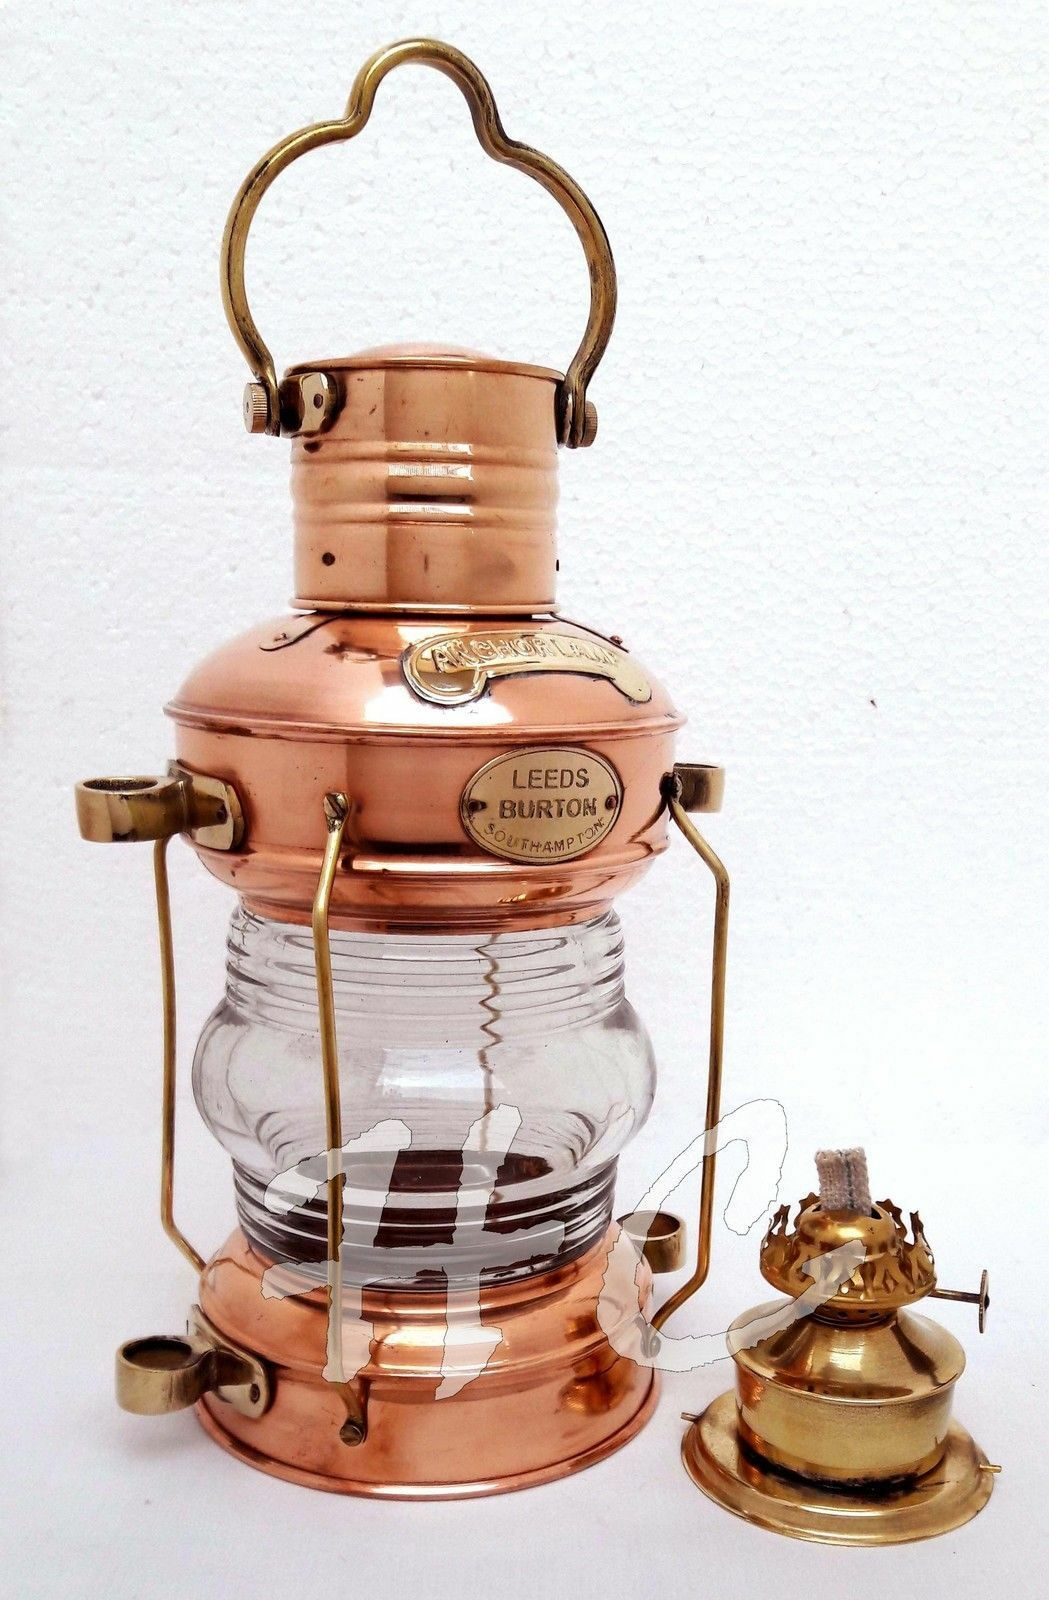 Anchor lantern company wrap around braided sleeving